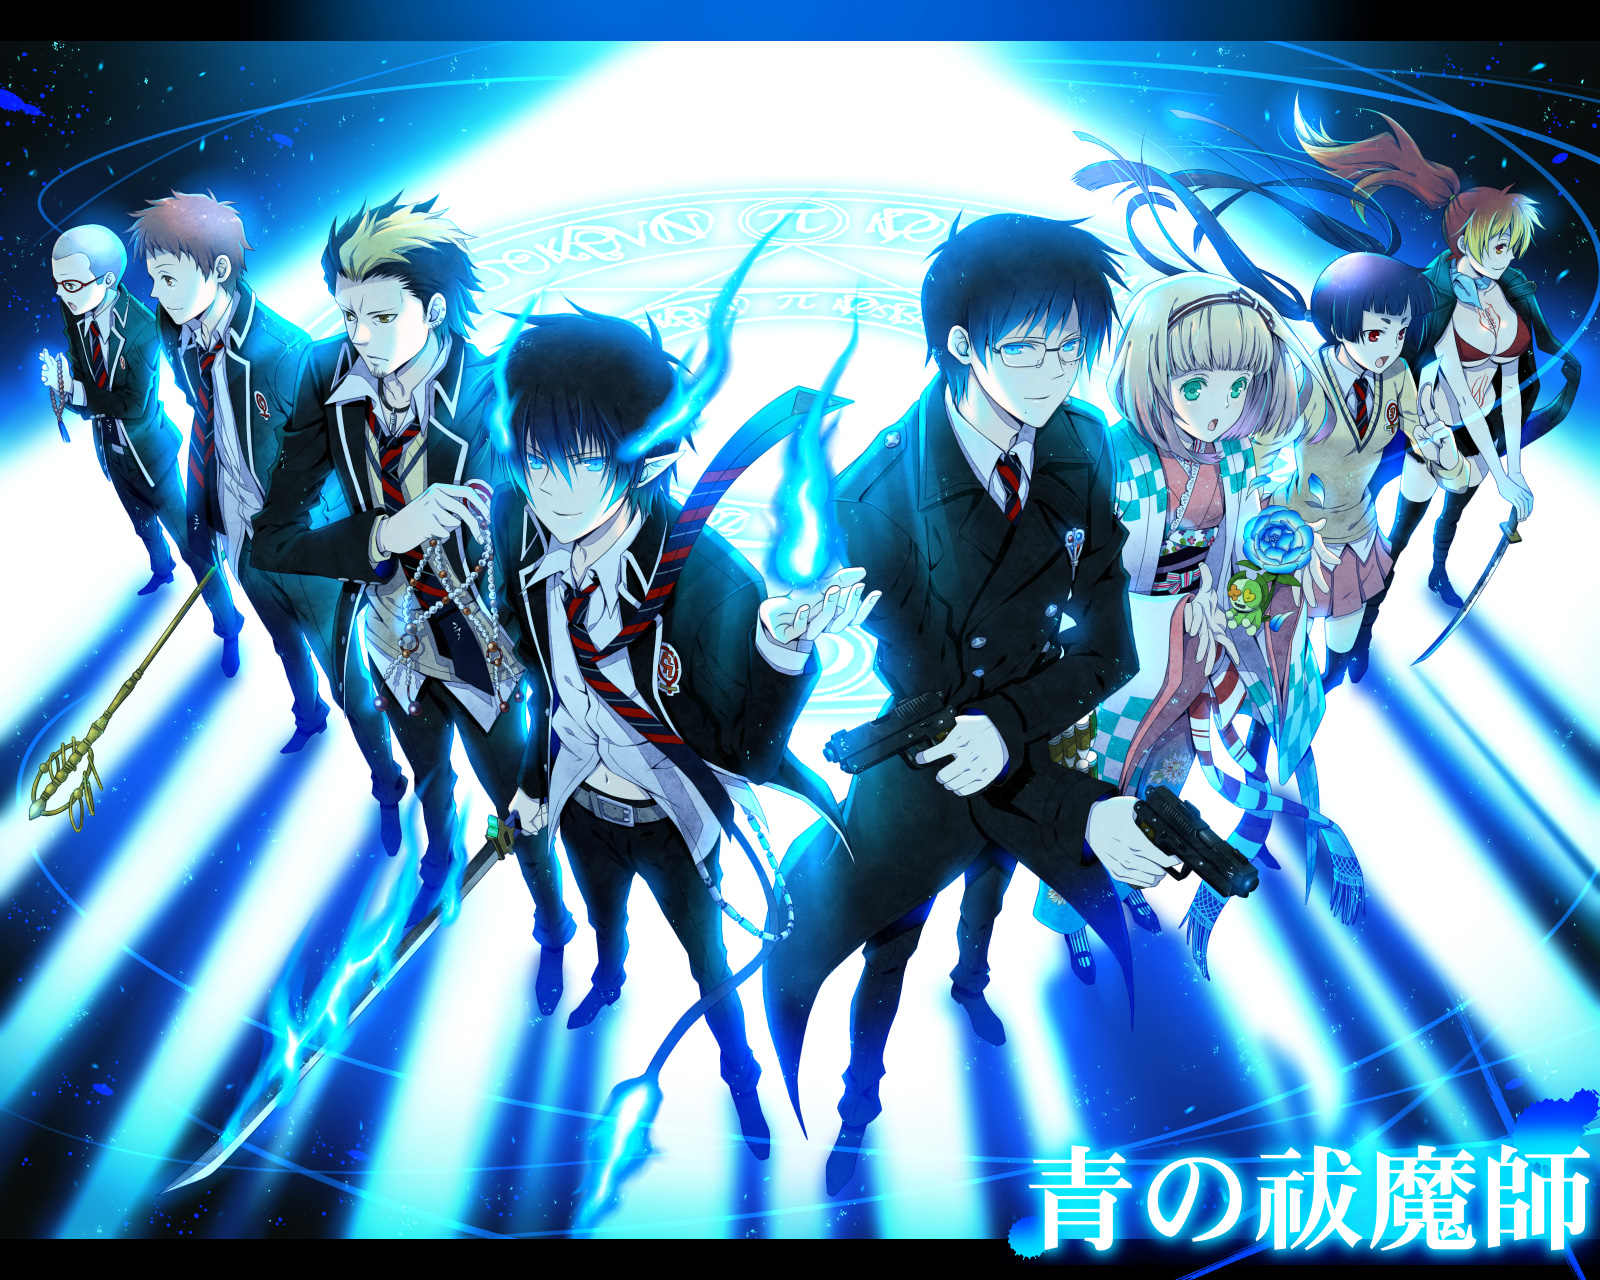 http://1.bp.blogspot.com/-ZHJGUczDGlc/T49jhcQyb5I/AAAAAAAAACo/4qXXnoeIRSc/s1600/flames_blue_magic_anime_boys_ao_no_exorcist_rin_okumura_yukio_shura_kirigakure_shiemi_moriyama_izumo_kamiki_ryuji_suguro_konekomaru_miwa_renzo_shima_wows_desktop_1600x1280_wallpaper-1084329.jpg